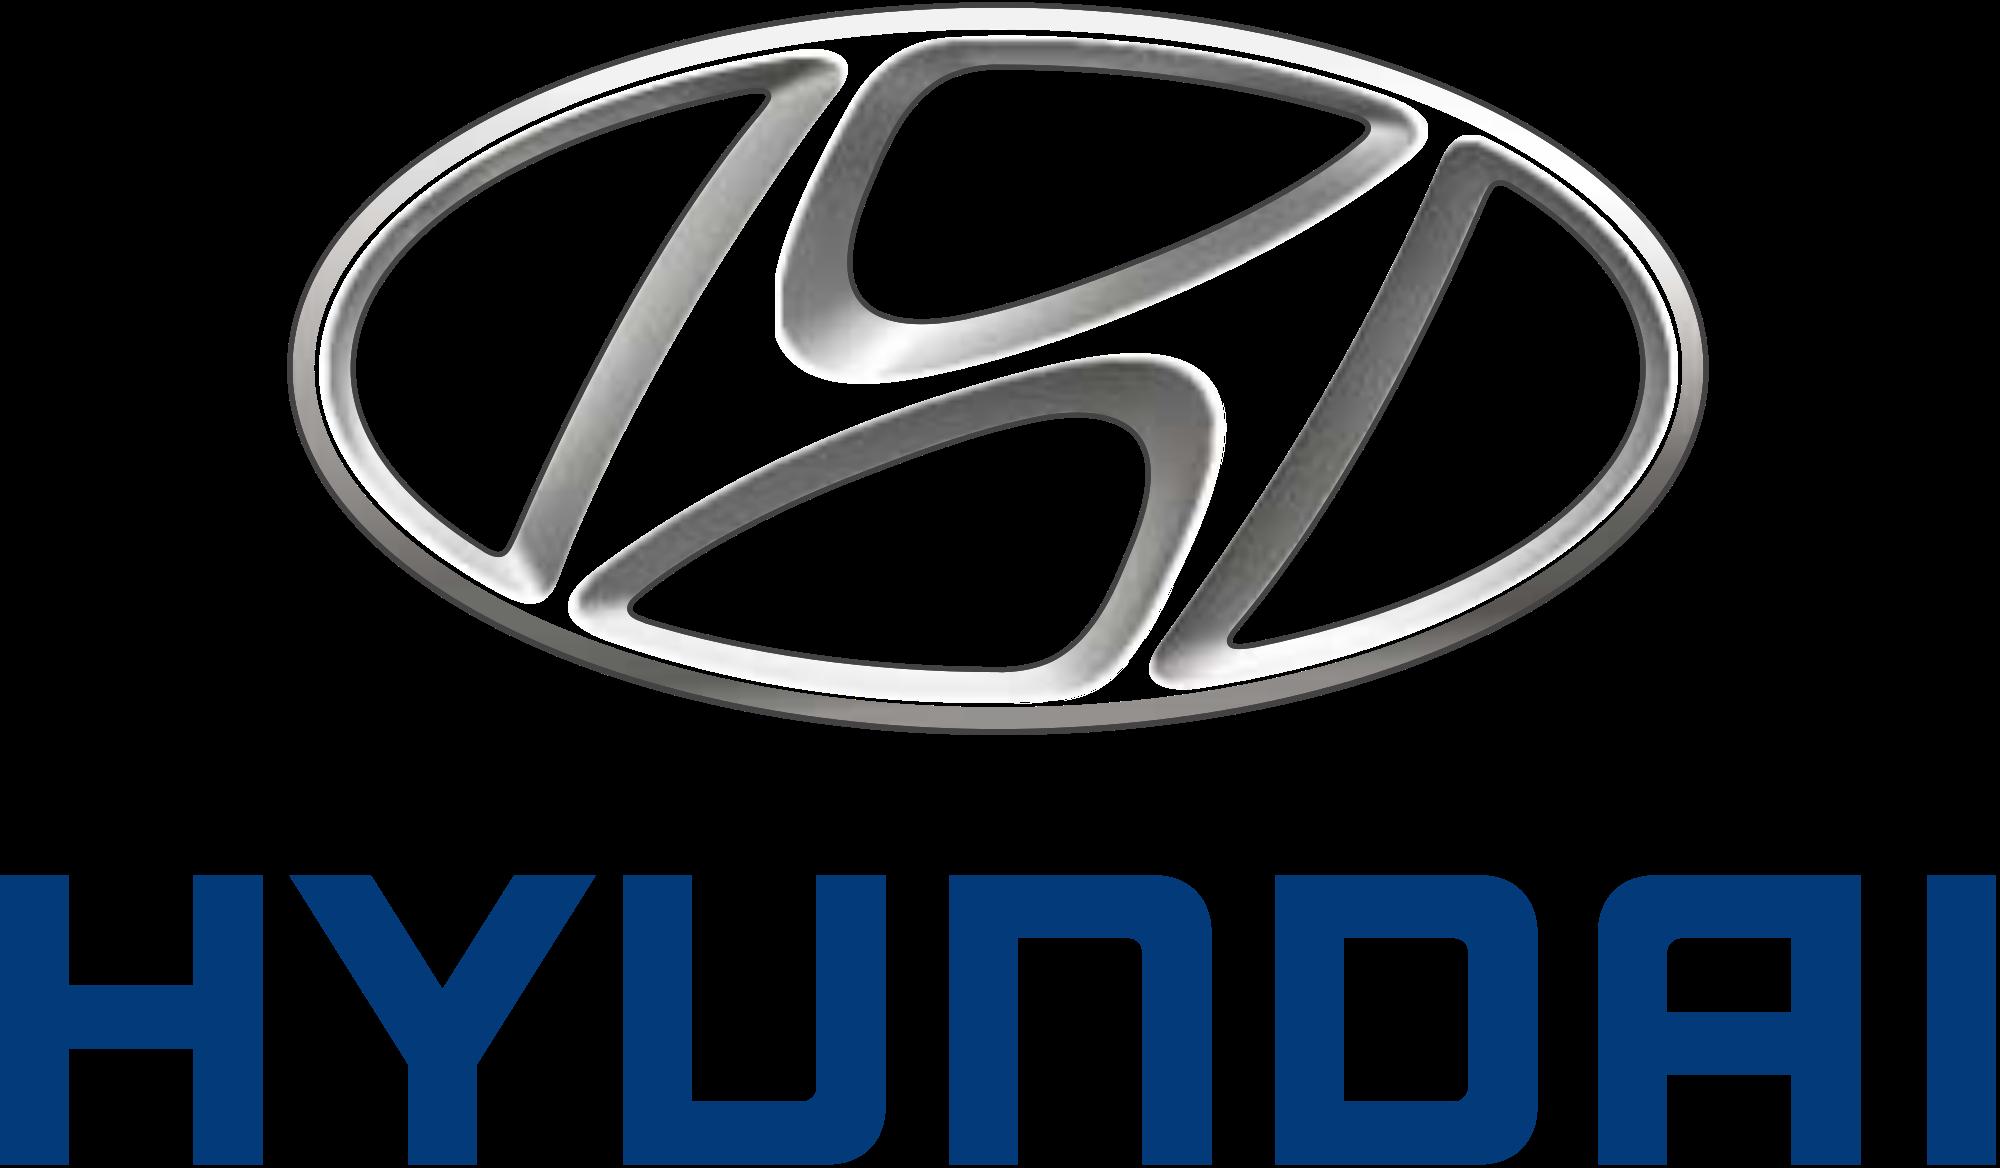 Hyundai Logo PNG Transparent Background Download - Hyundai Vector Logo PNG